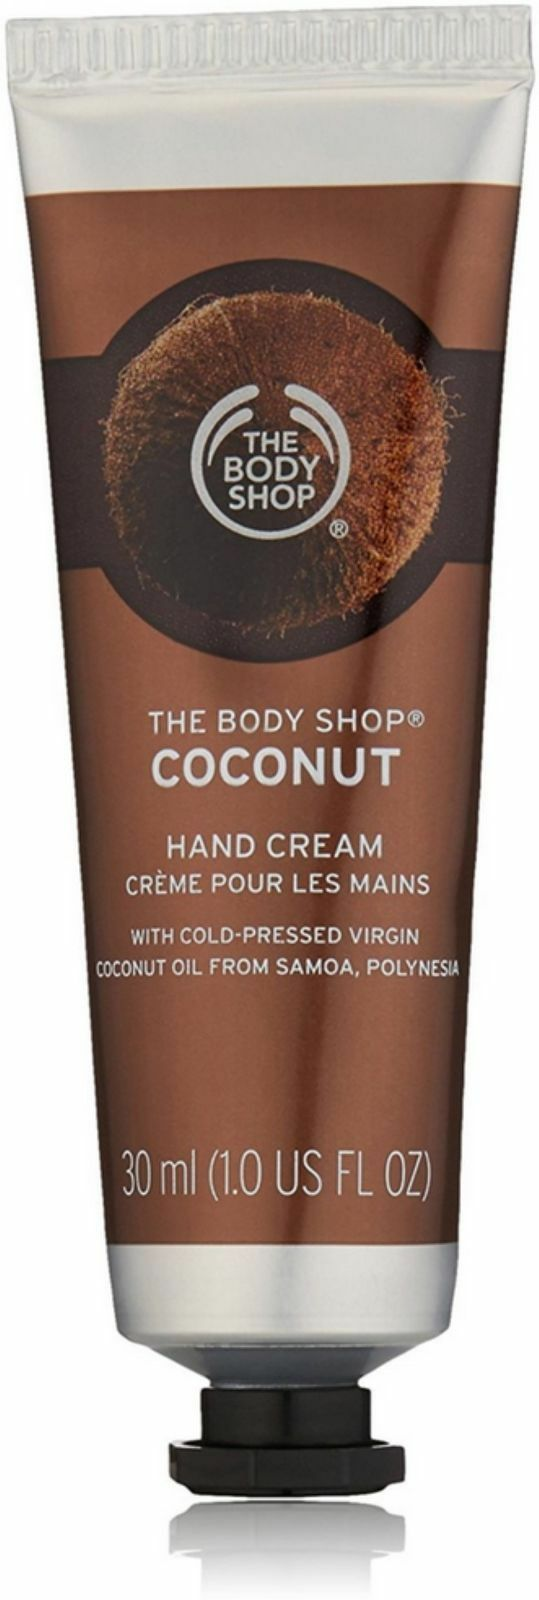 The Body Shop Coconut Hand Cream 1 oz